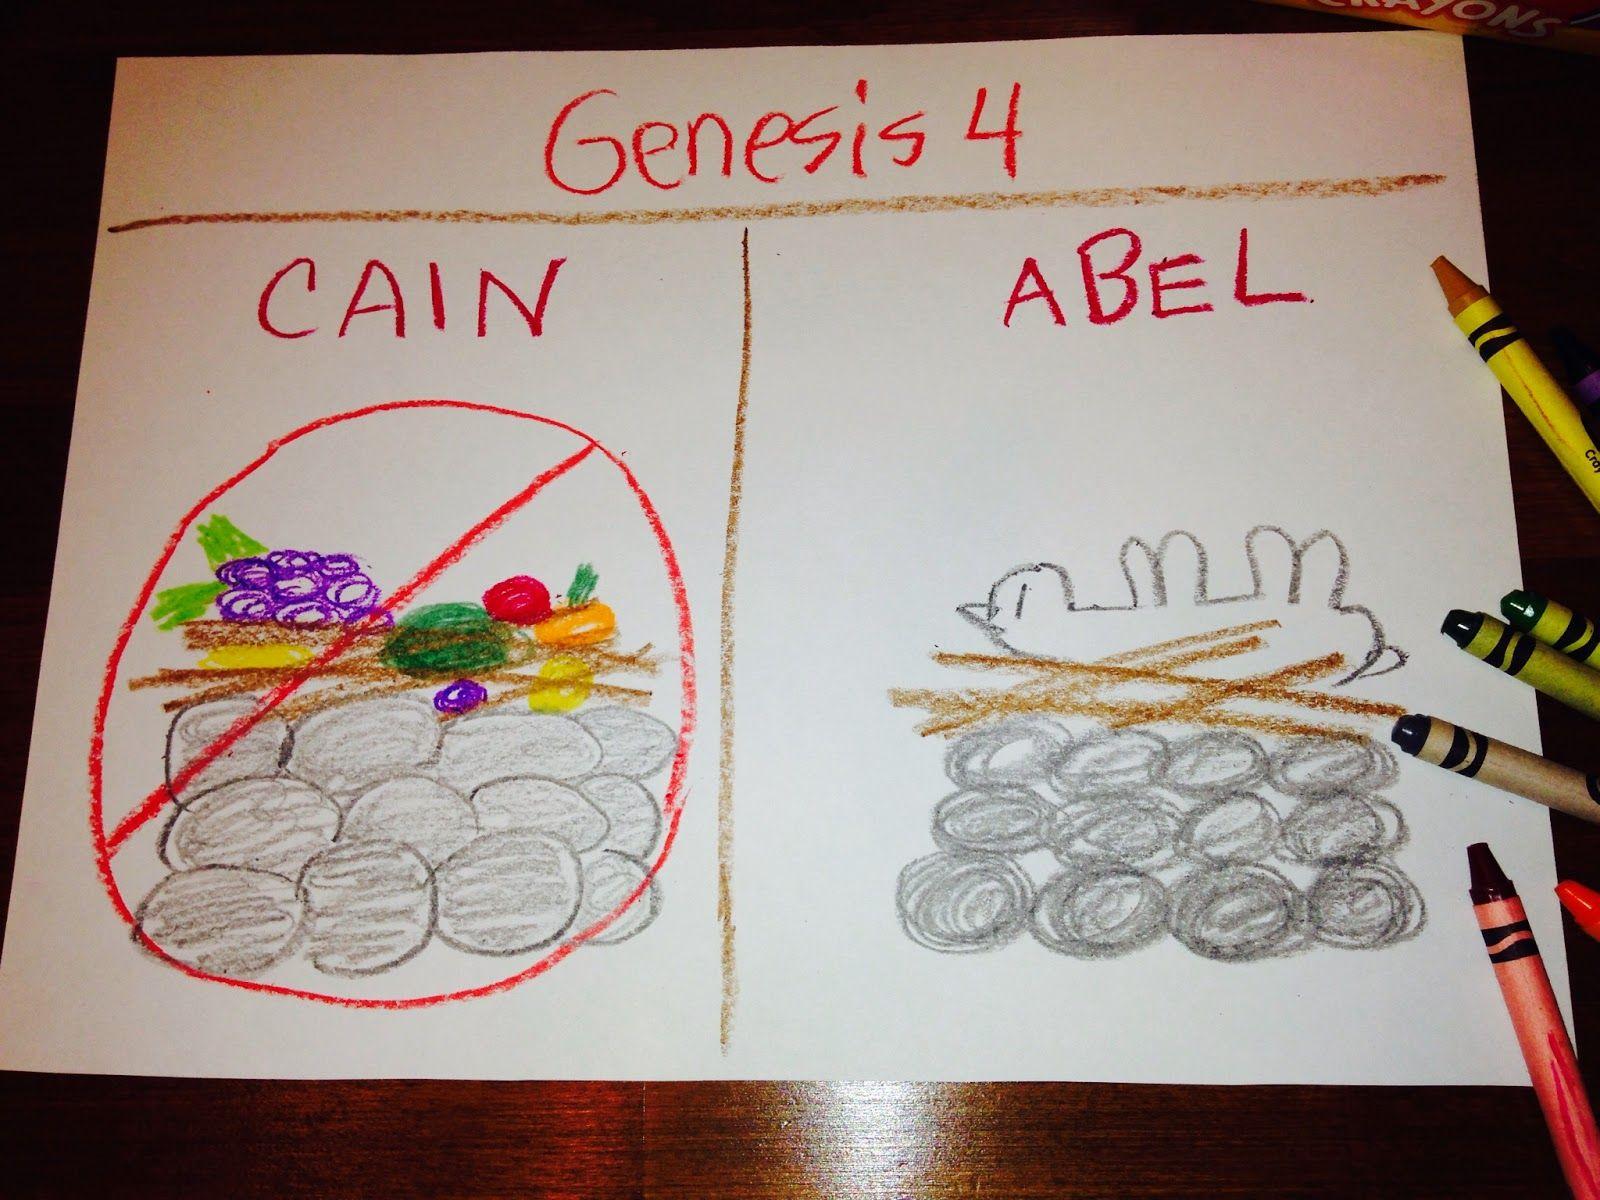 Cain and abel craft ideas - Children Bible Lessons Kids Bible Children S Genesis Book Genesis 1 Cain And Abel Memory Verse Children S Bible Bible Activities